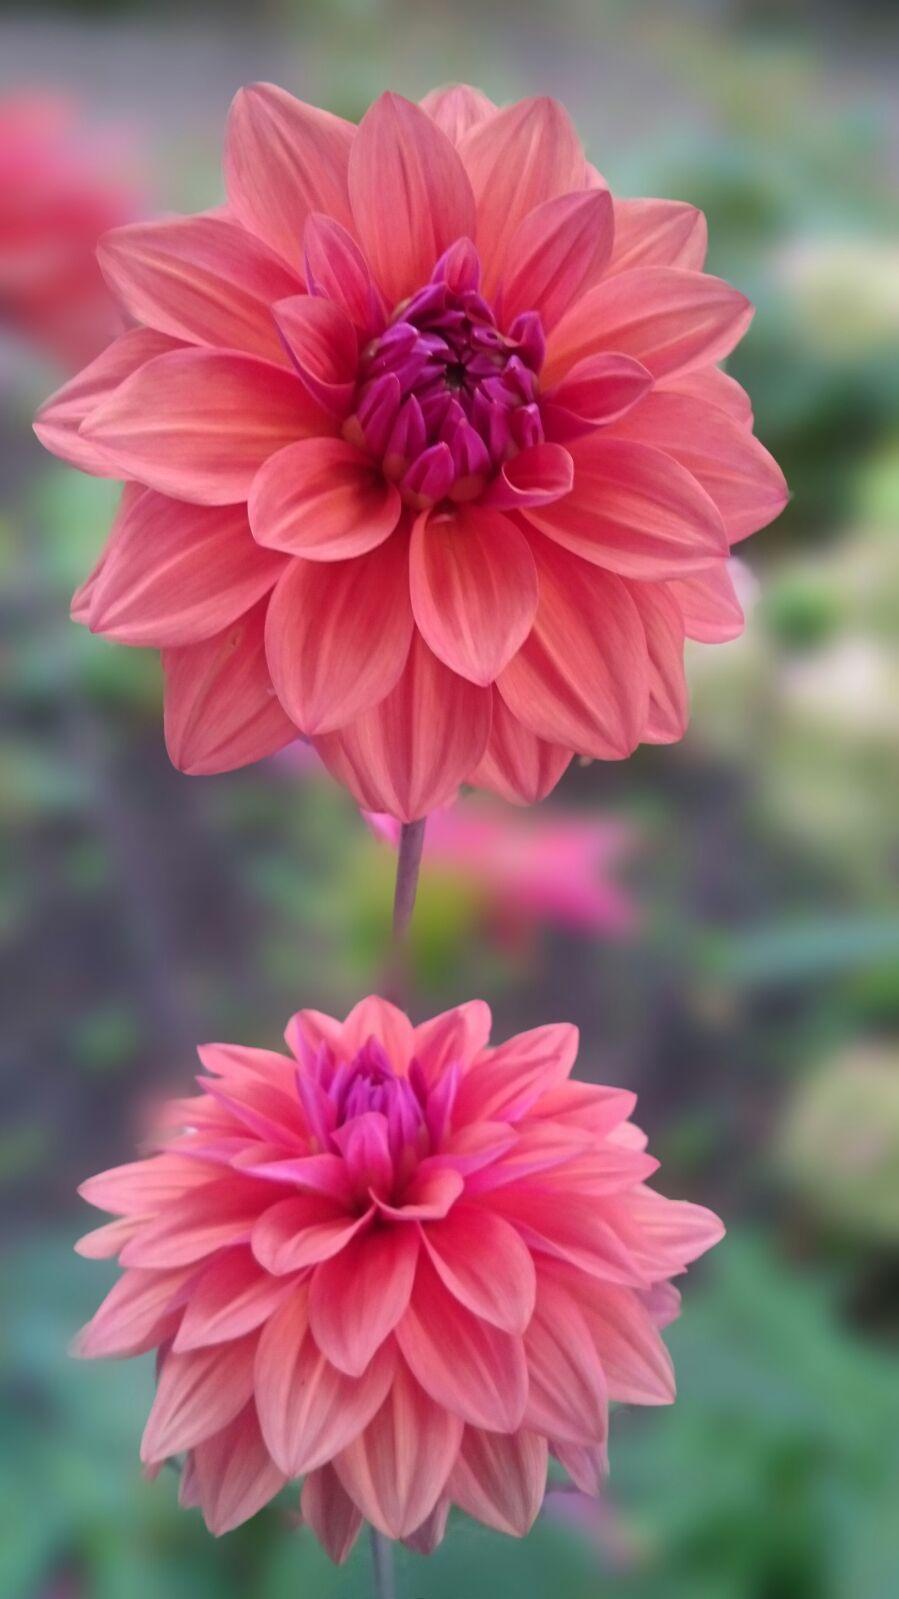 Pin By Amar Kumar On Flowers Painting Flowers Tutorial Pretty Flowers Beautiful Flowers